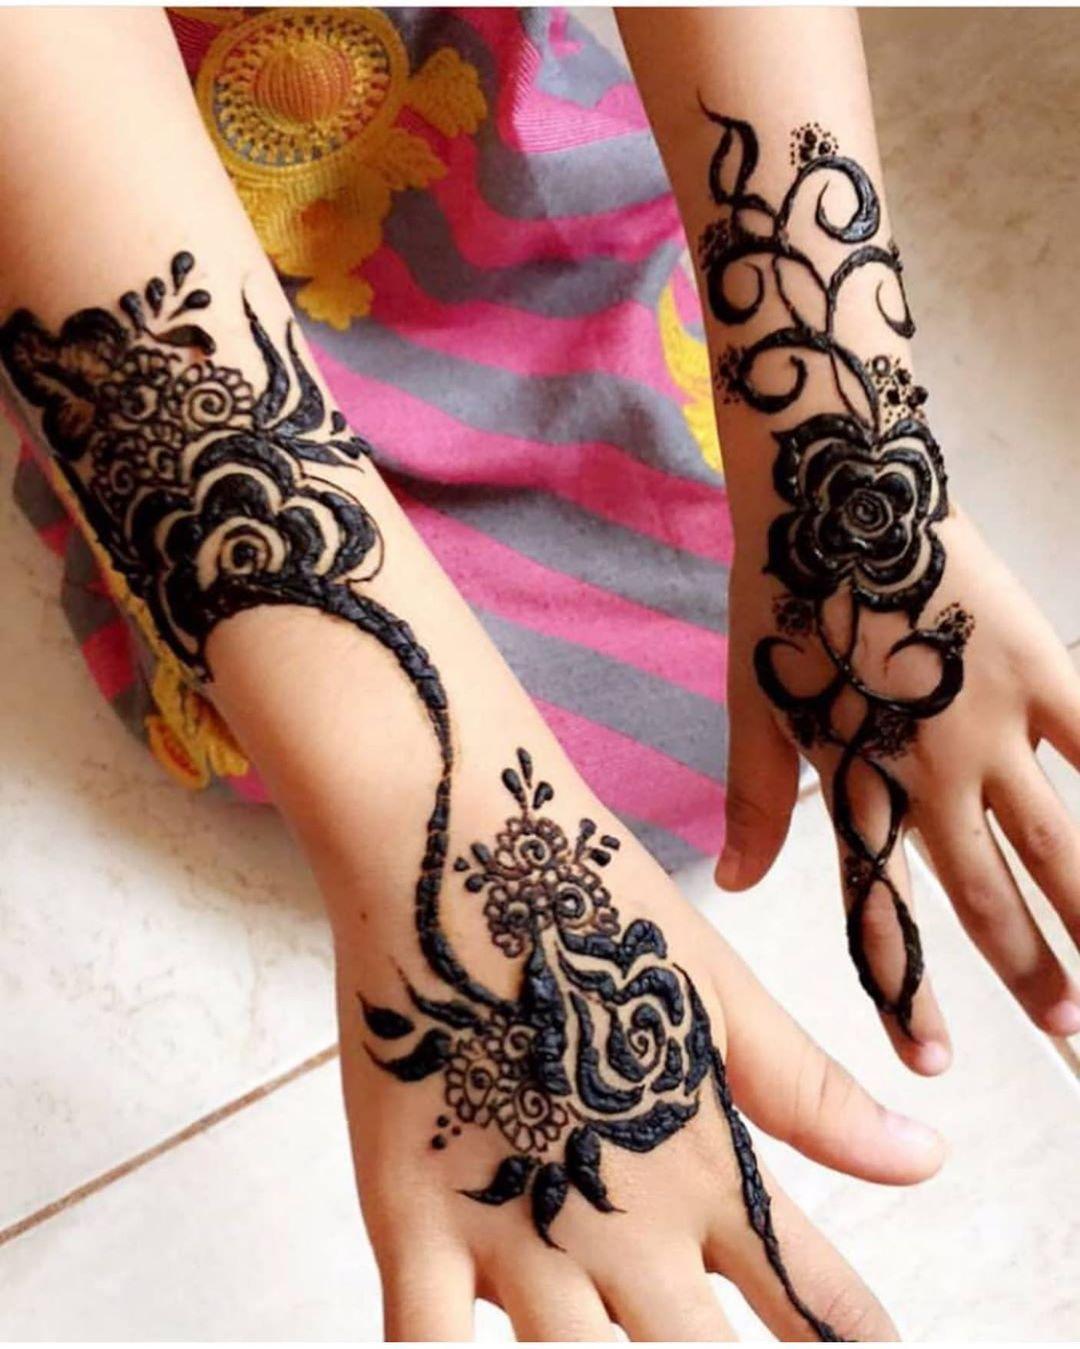 Pin By Asnabinthjahangir On Henna Henna Hand Tattoo Hand Henna Hand Tattoos